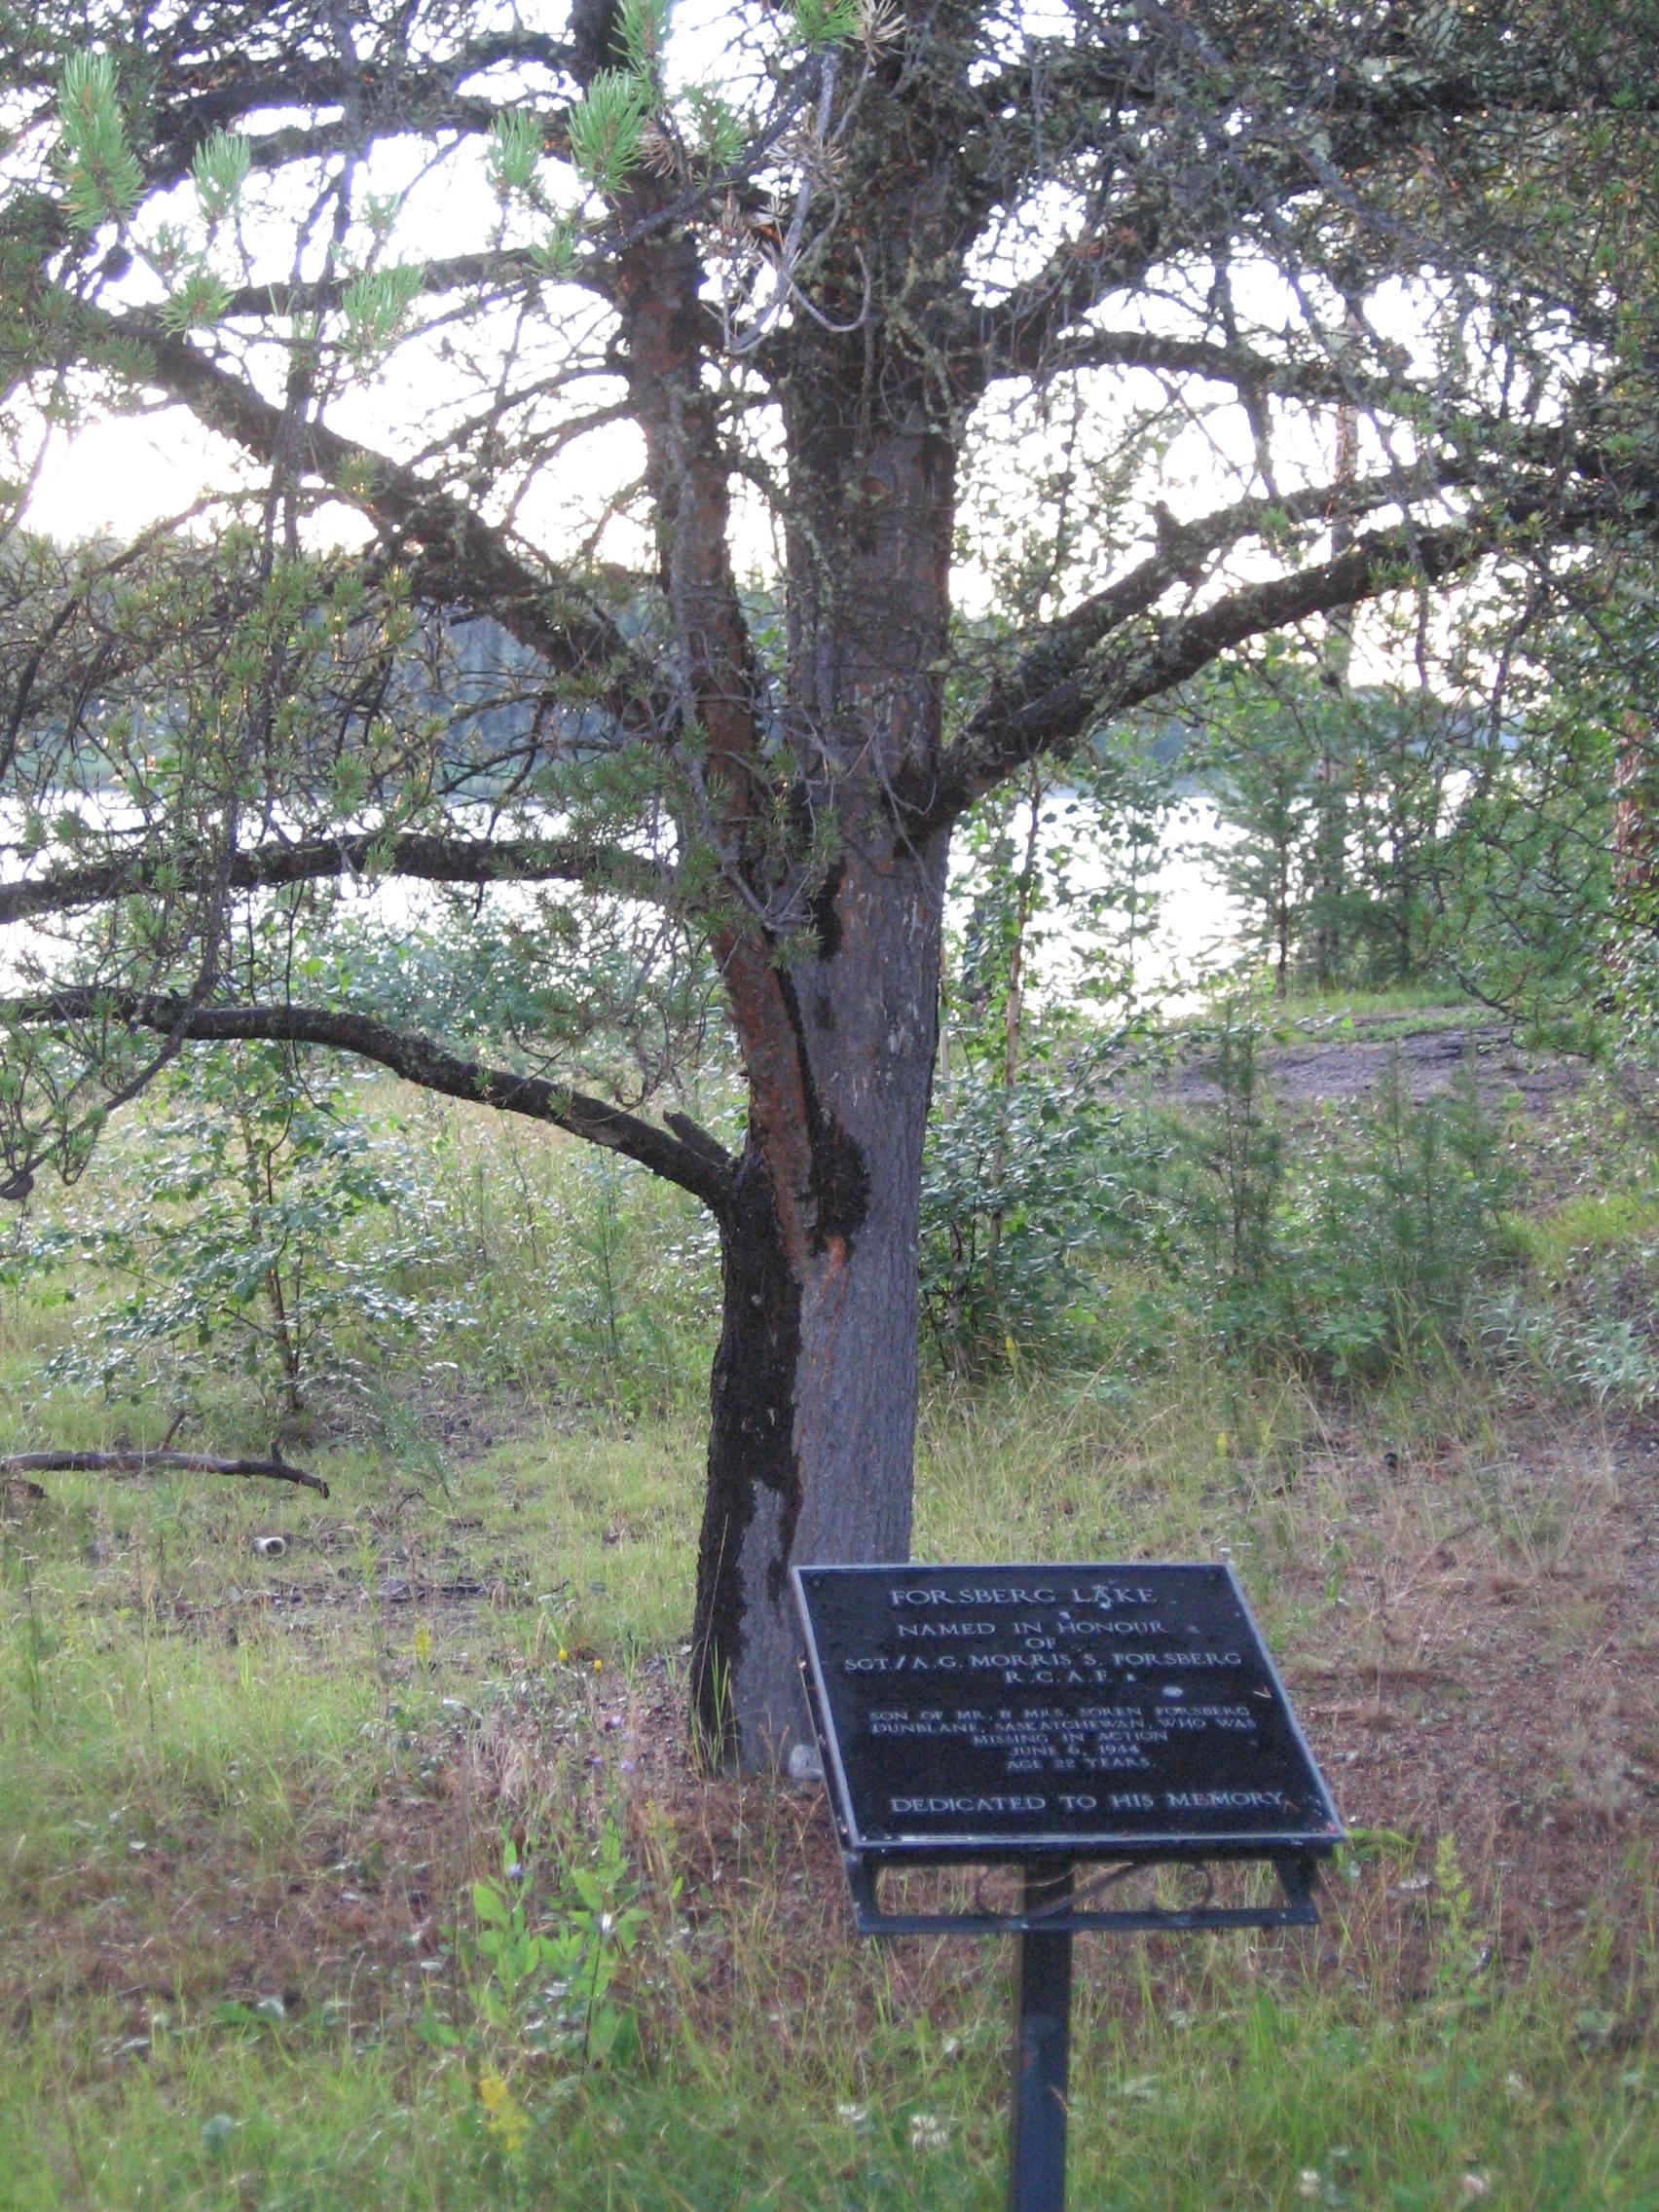 Memorial Plaque– Photo of memorial plaque placed in memory of M.S. Forsberg at Forsberg Lake, Northern Saskatchewan